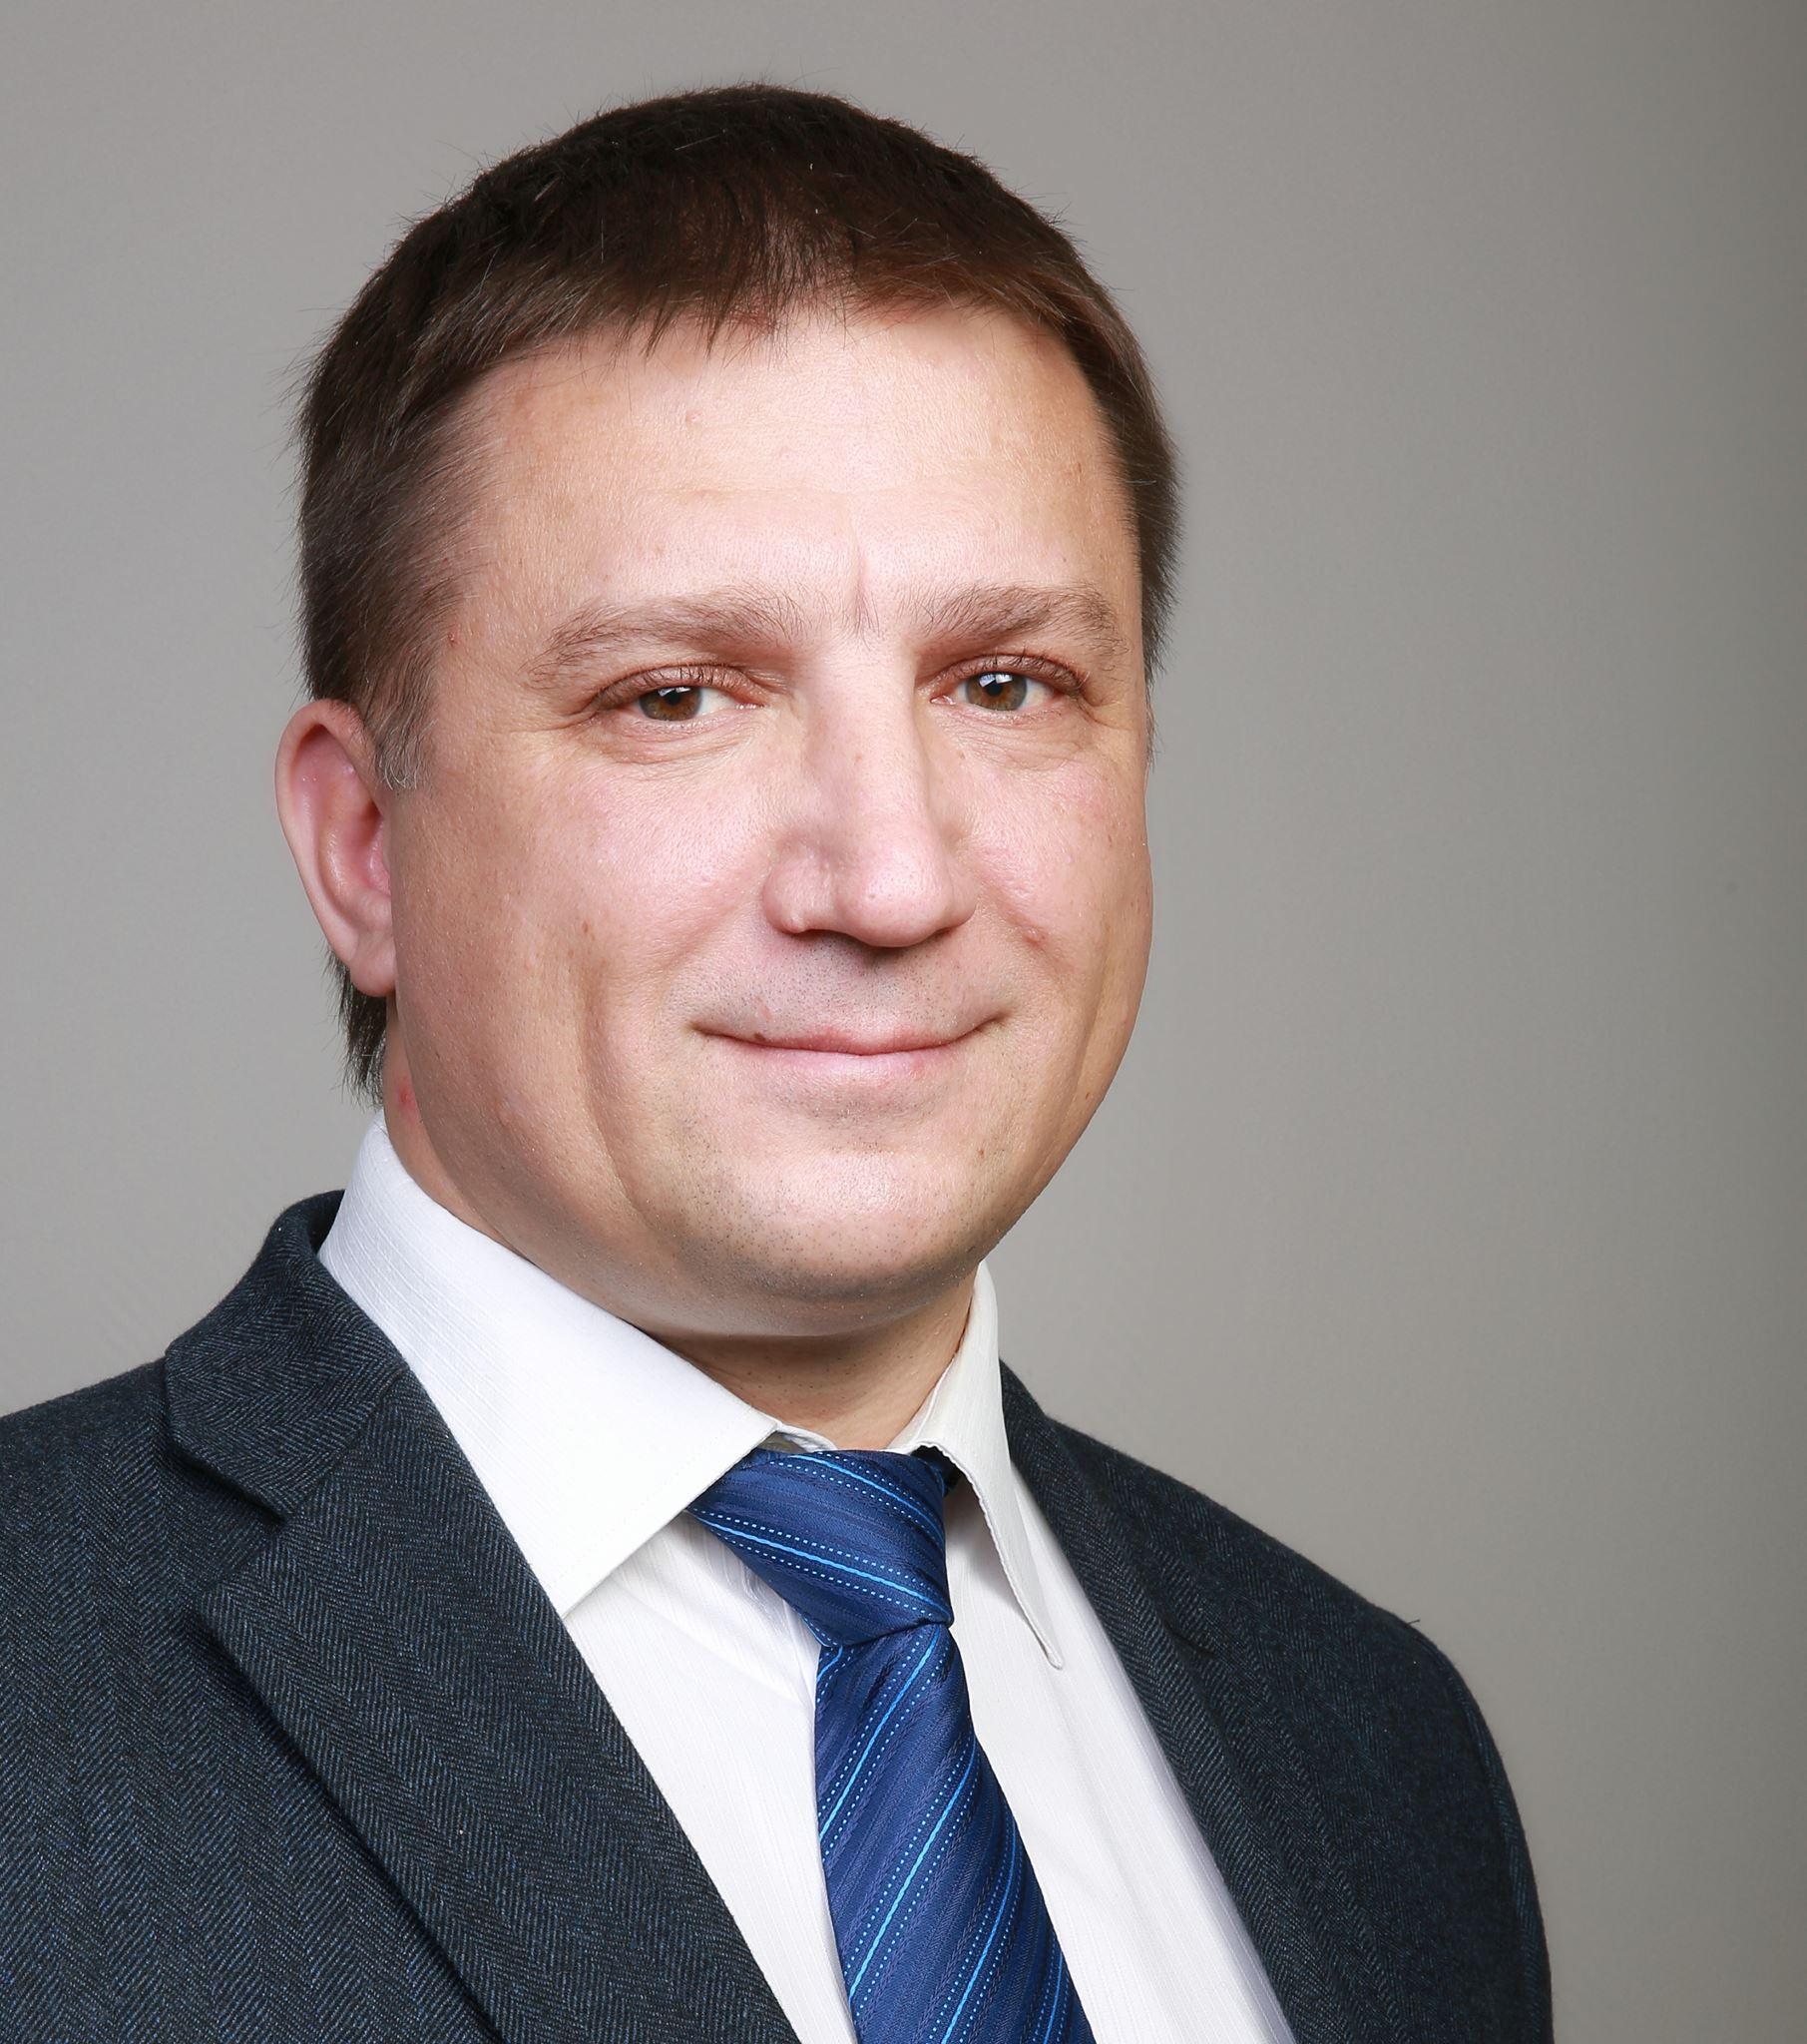 Олег Клянчин возглавит мурманский филиал Tele2